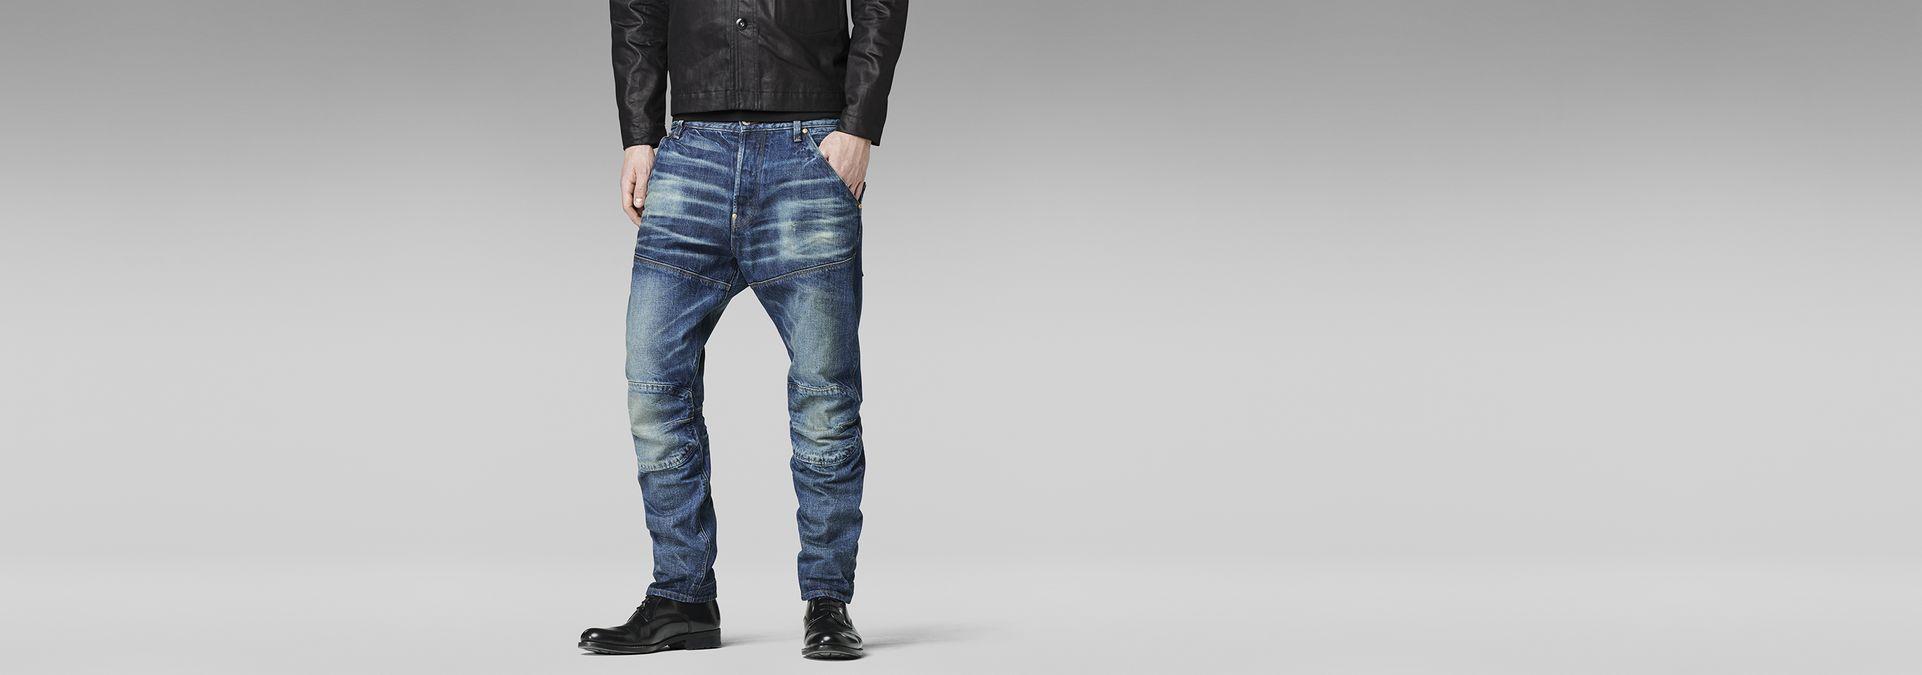 re 5620 g star elwood japan 3d loose tapered jeans g star raw. Black Bedroom Furniture Sets. Home Design Ideas